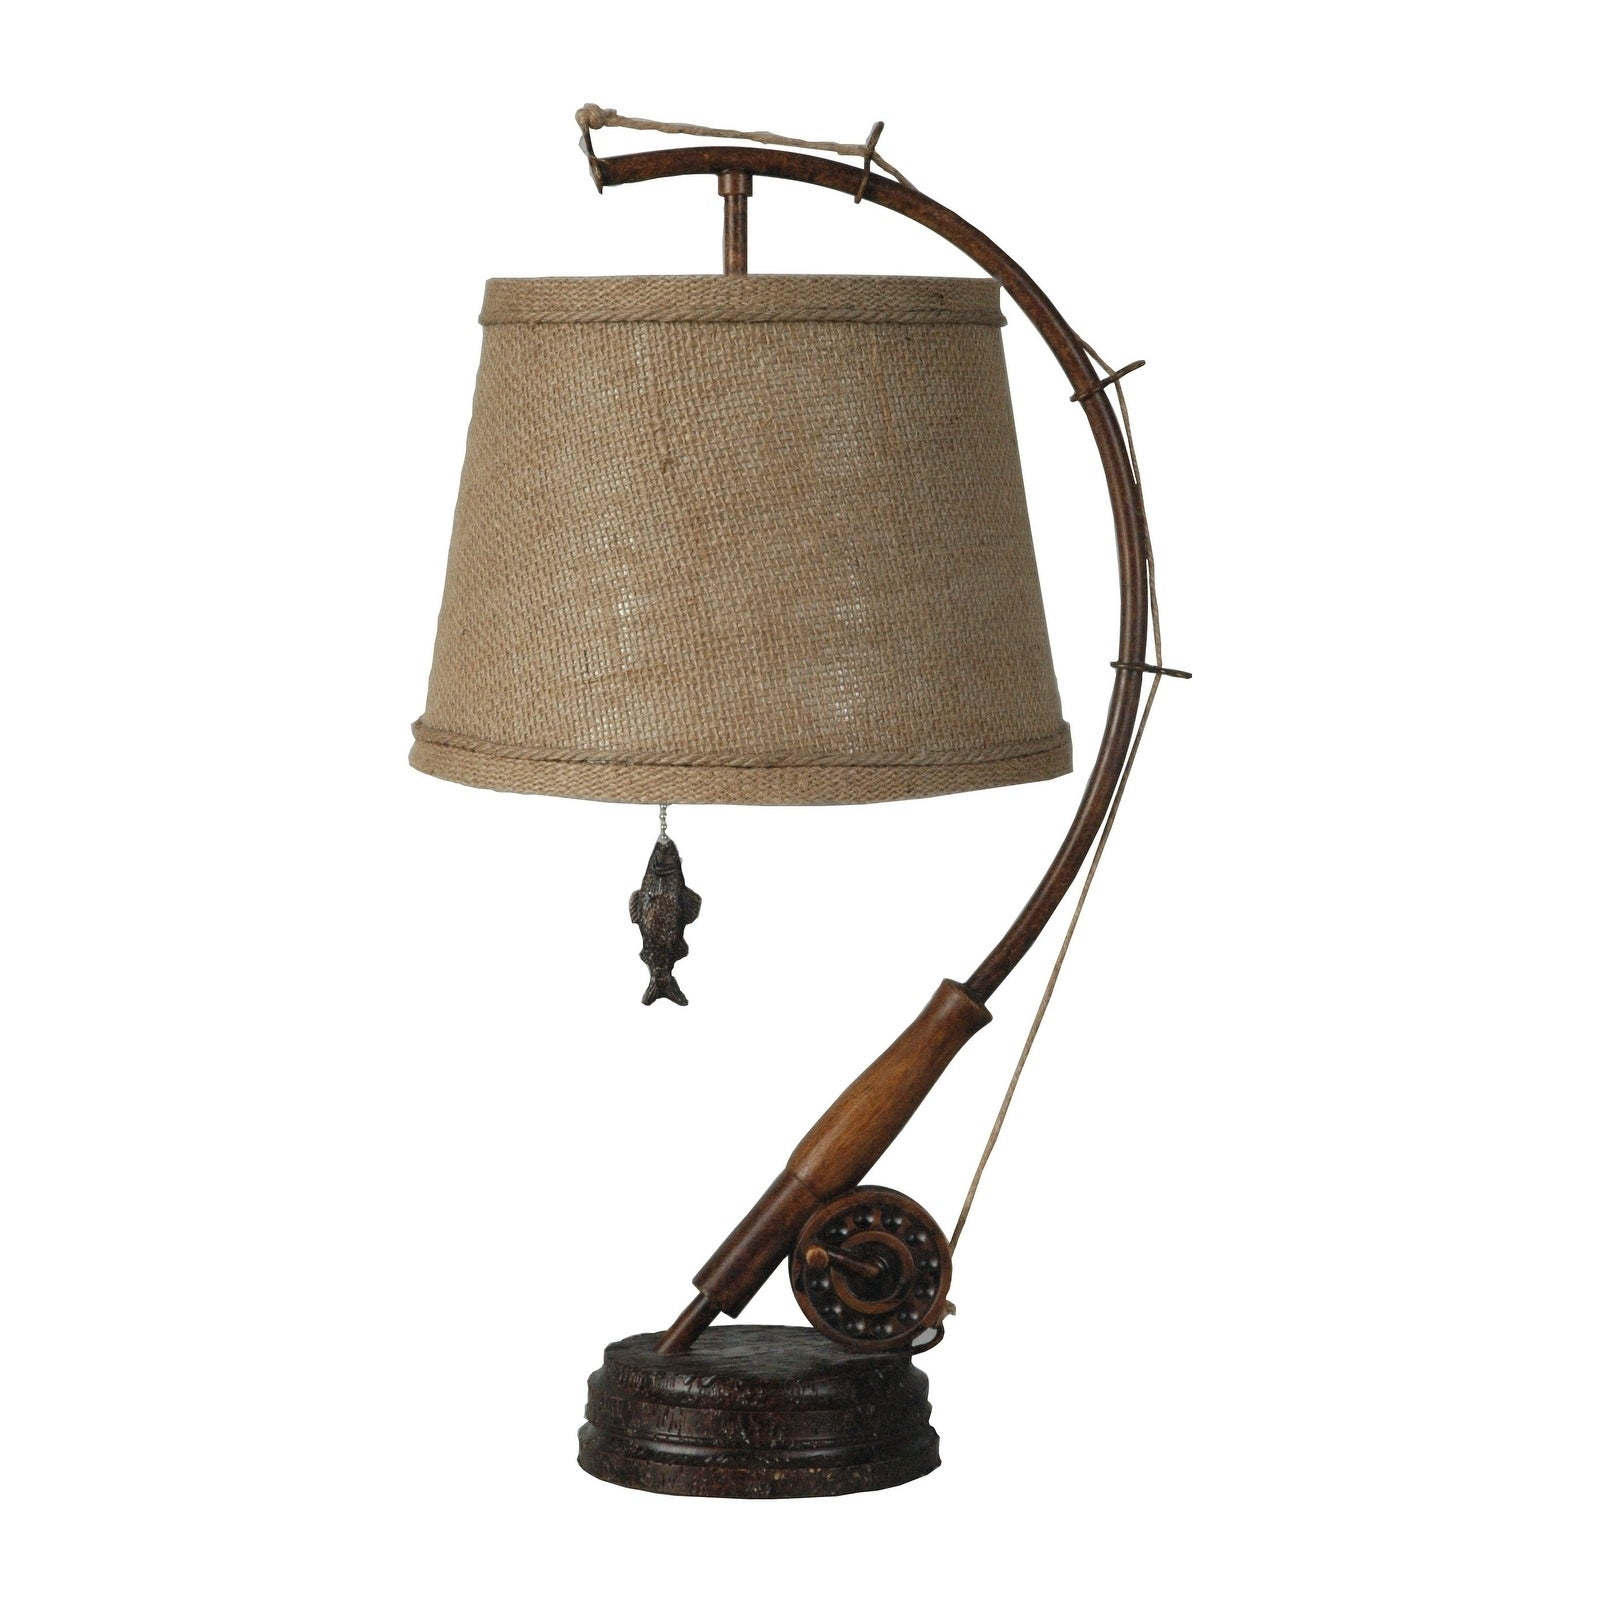 Table Lamp Fishing Rod Reel Shade Set 2 Home Decor Cabin ...